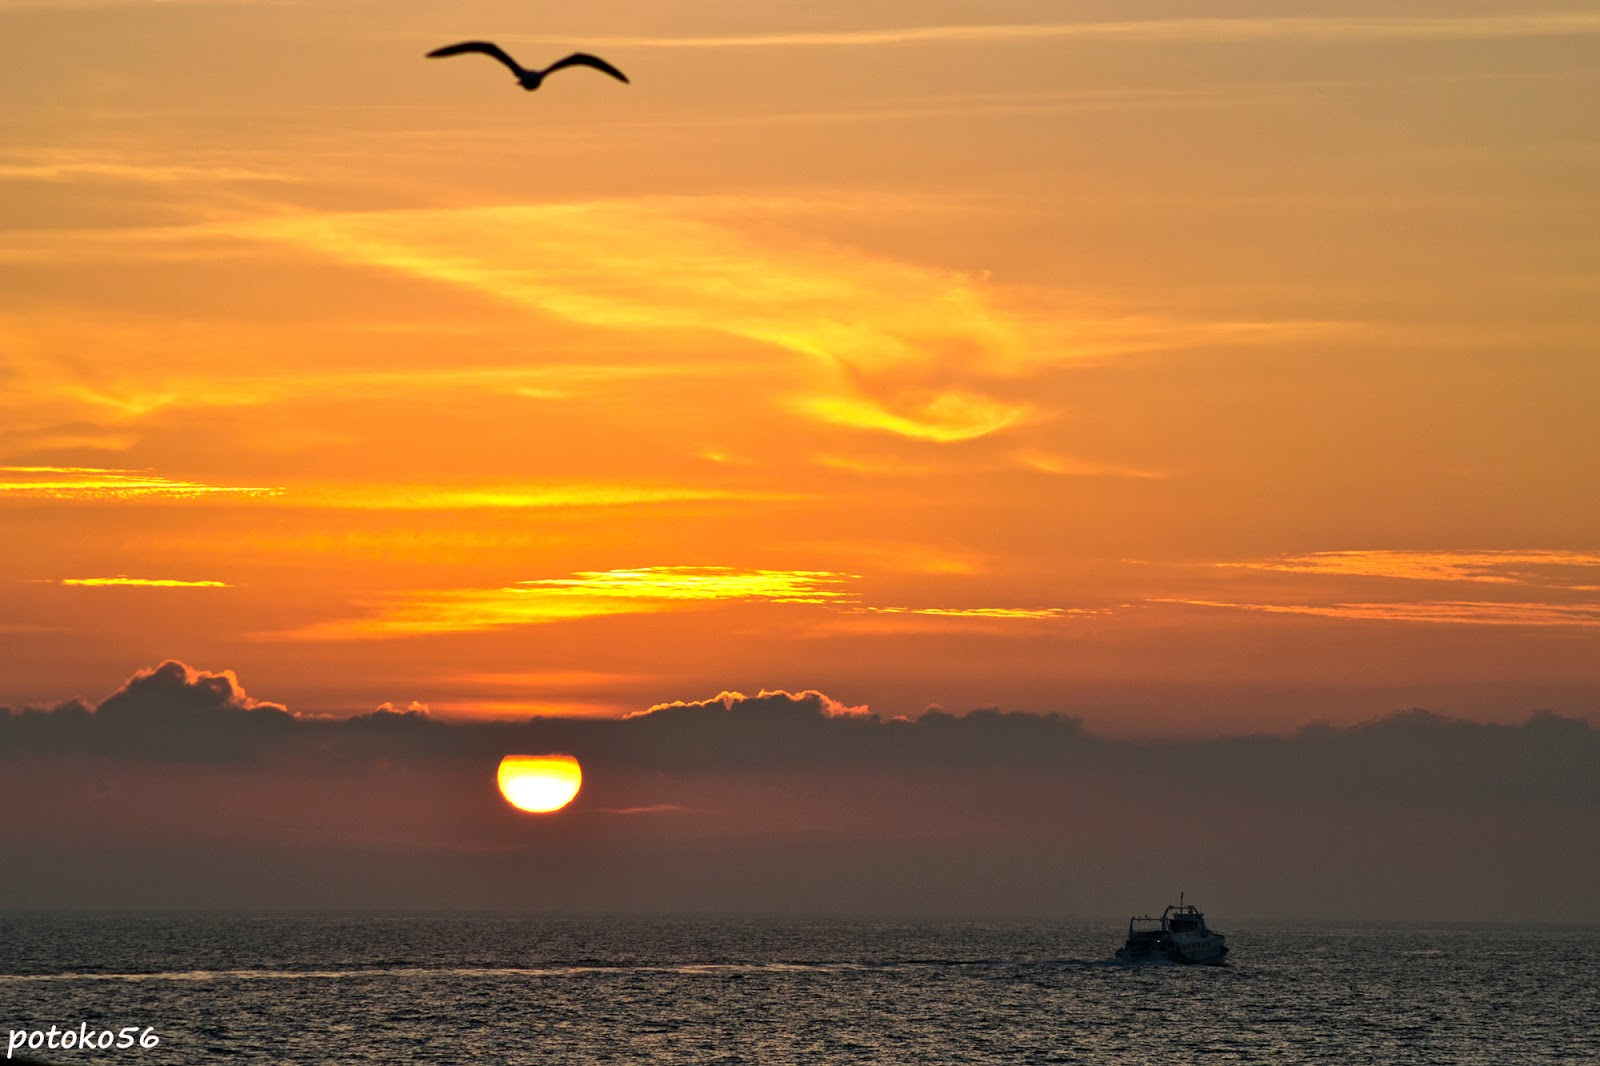 Catamarán - Gaviota - Amanecer